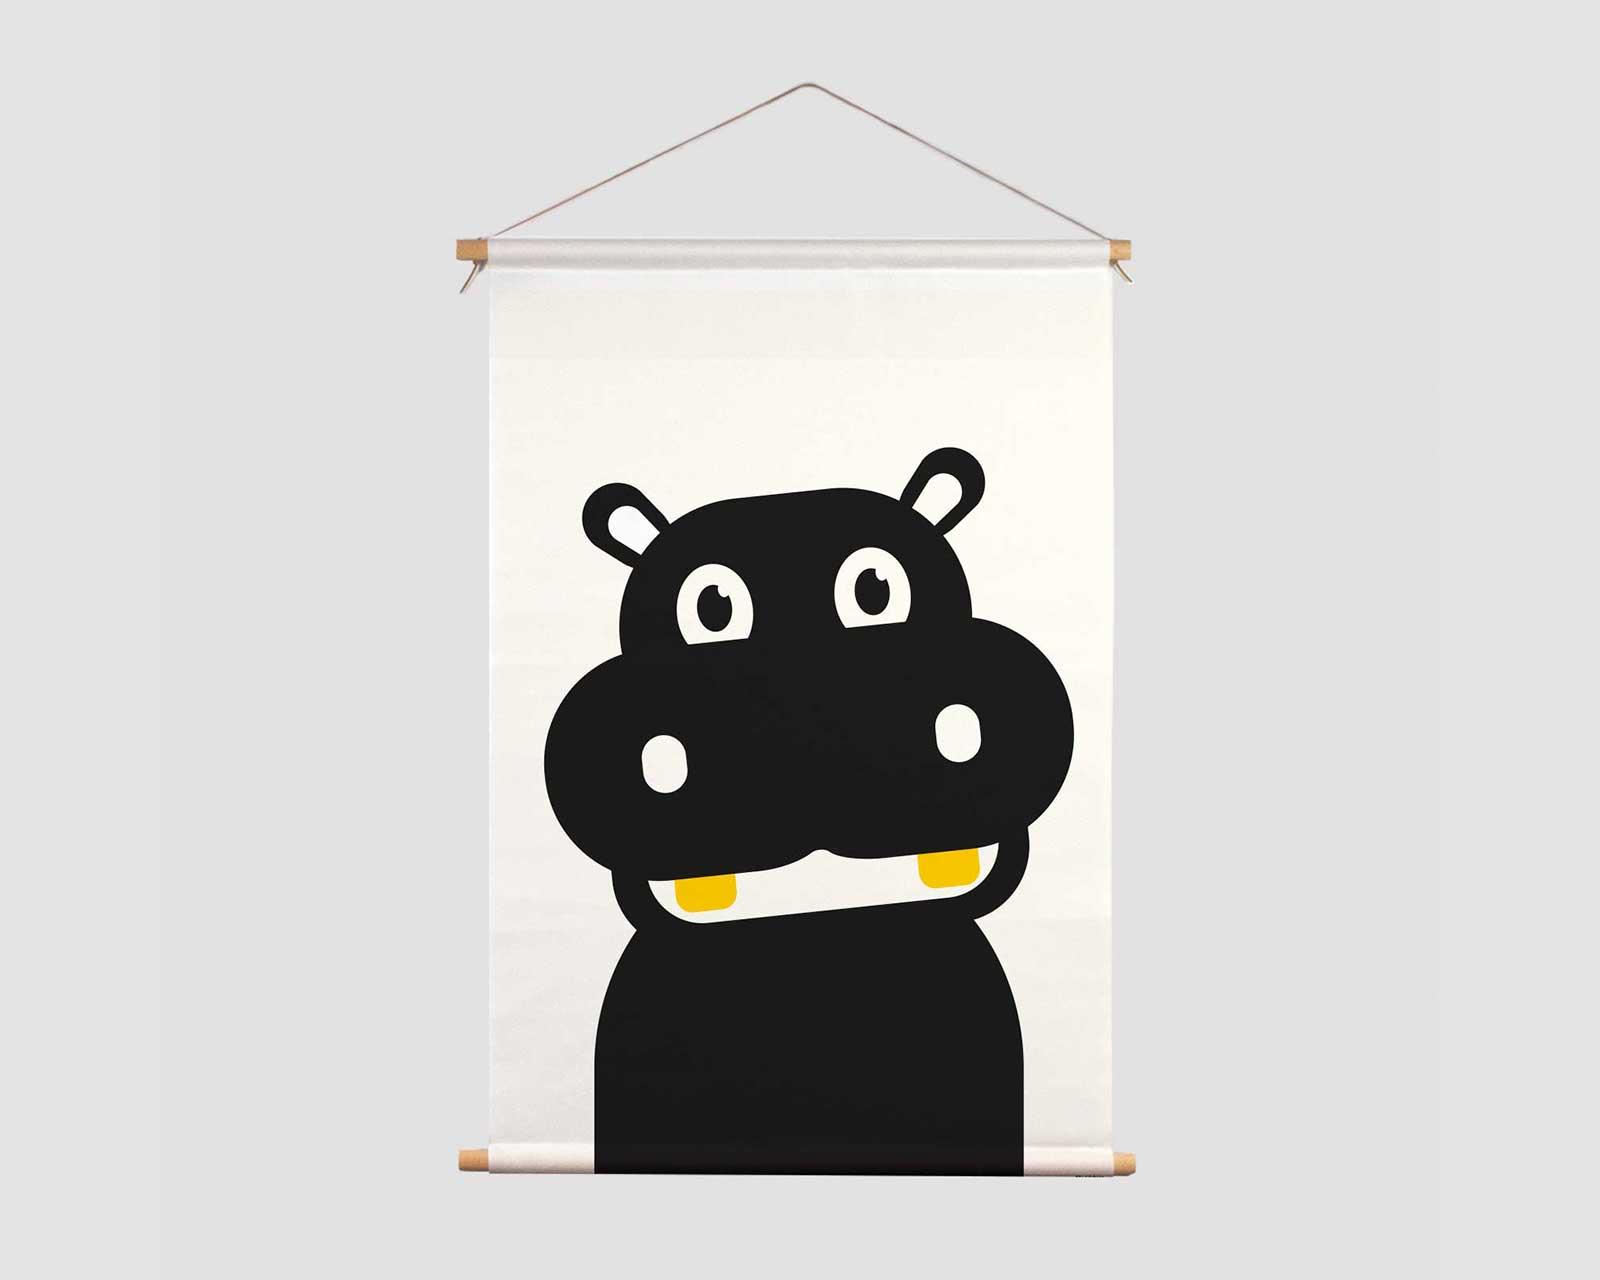 Textielposter zwart-wit print aapje Pie Hippo t'amo nijlpaard zwart wit kraamcadeau jungle decoratie kinderkamer